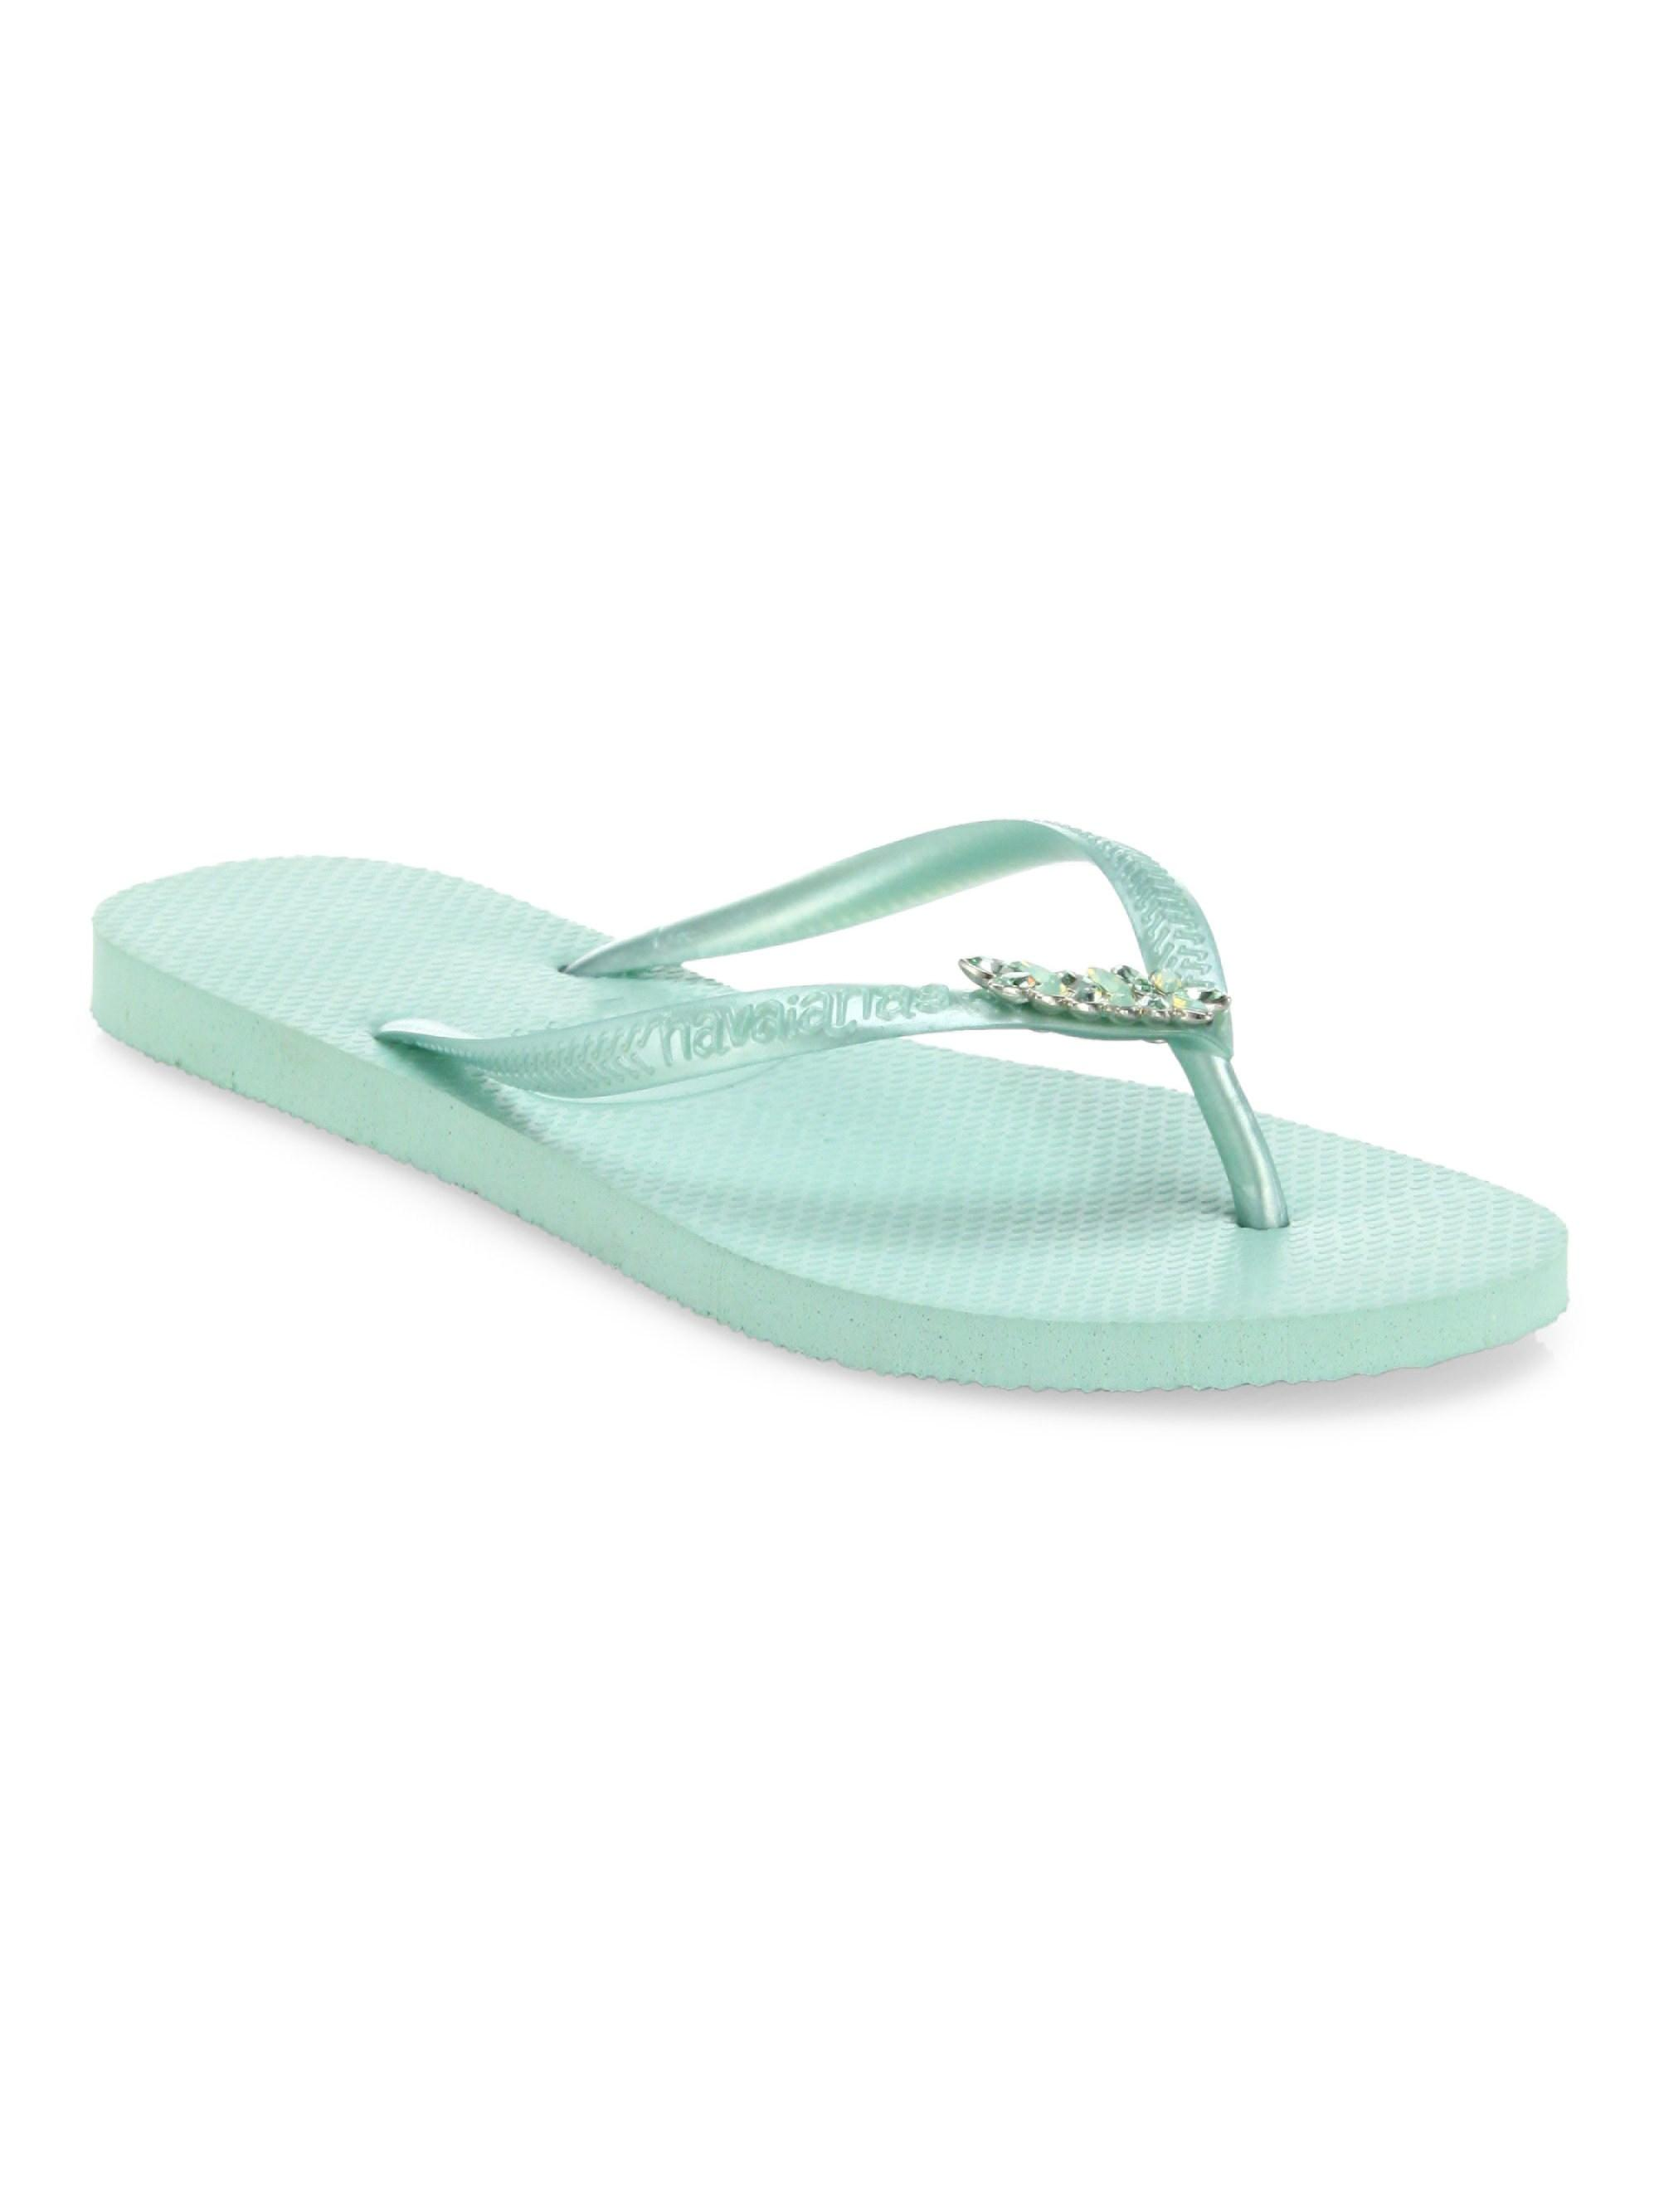 d1b52bb29 Lyst - Havaianas Women s Slim Lux Swarovski Crystal Flip Flops ...